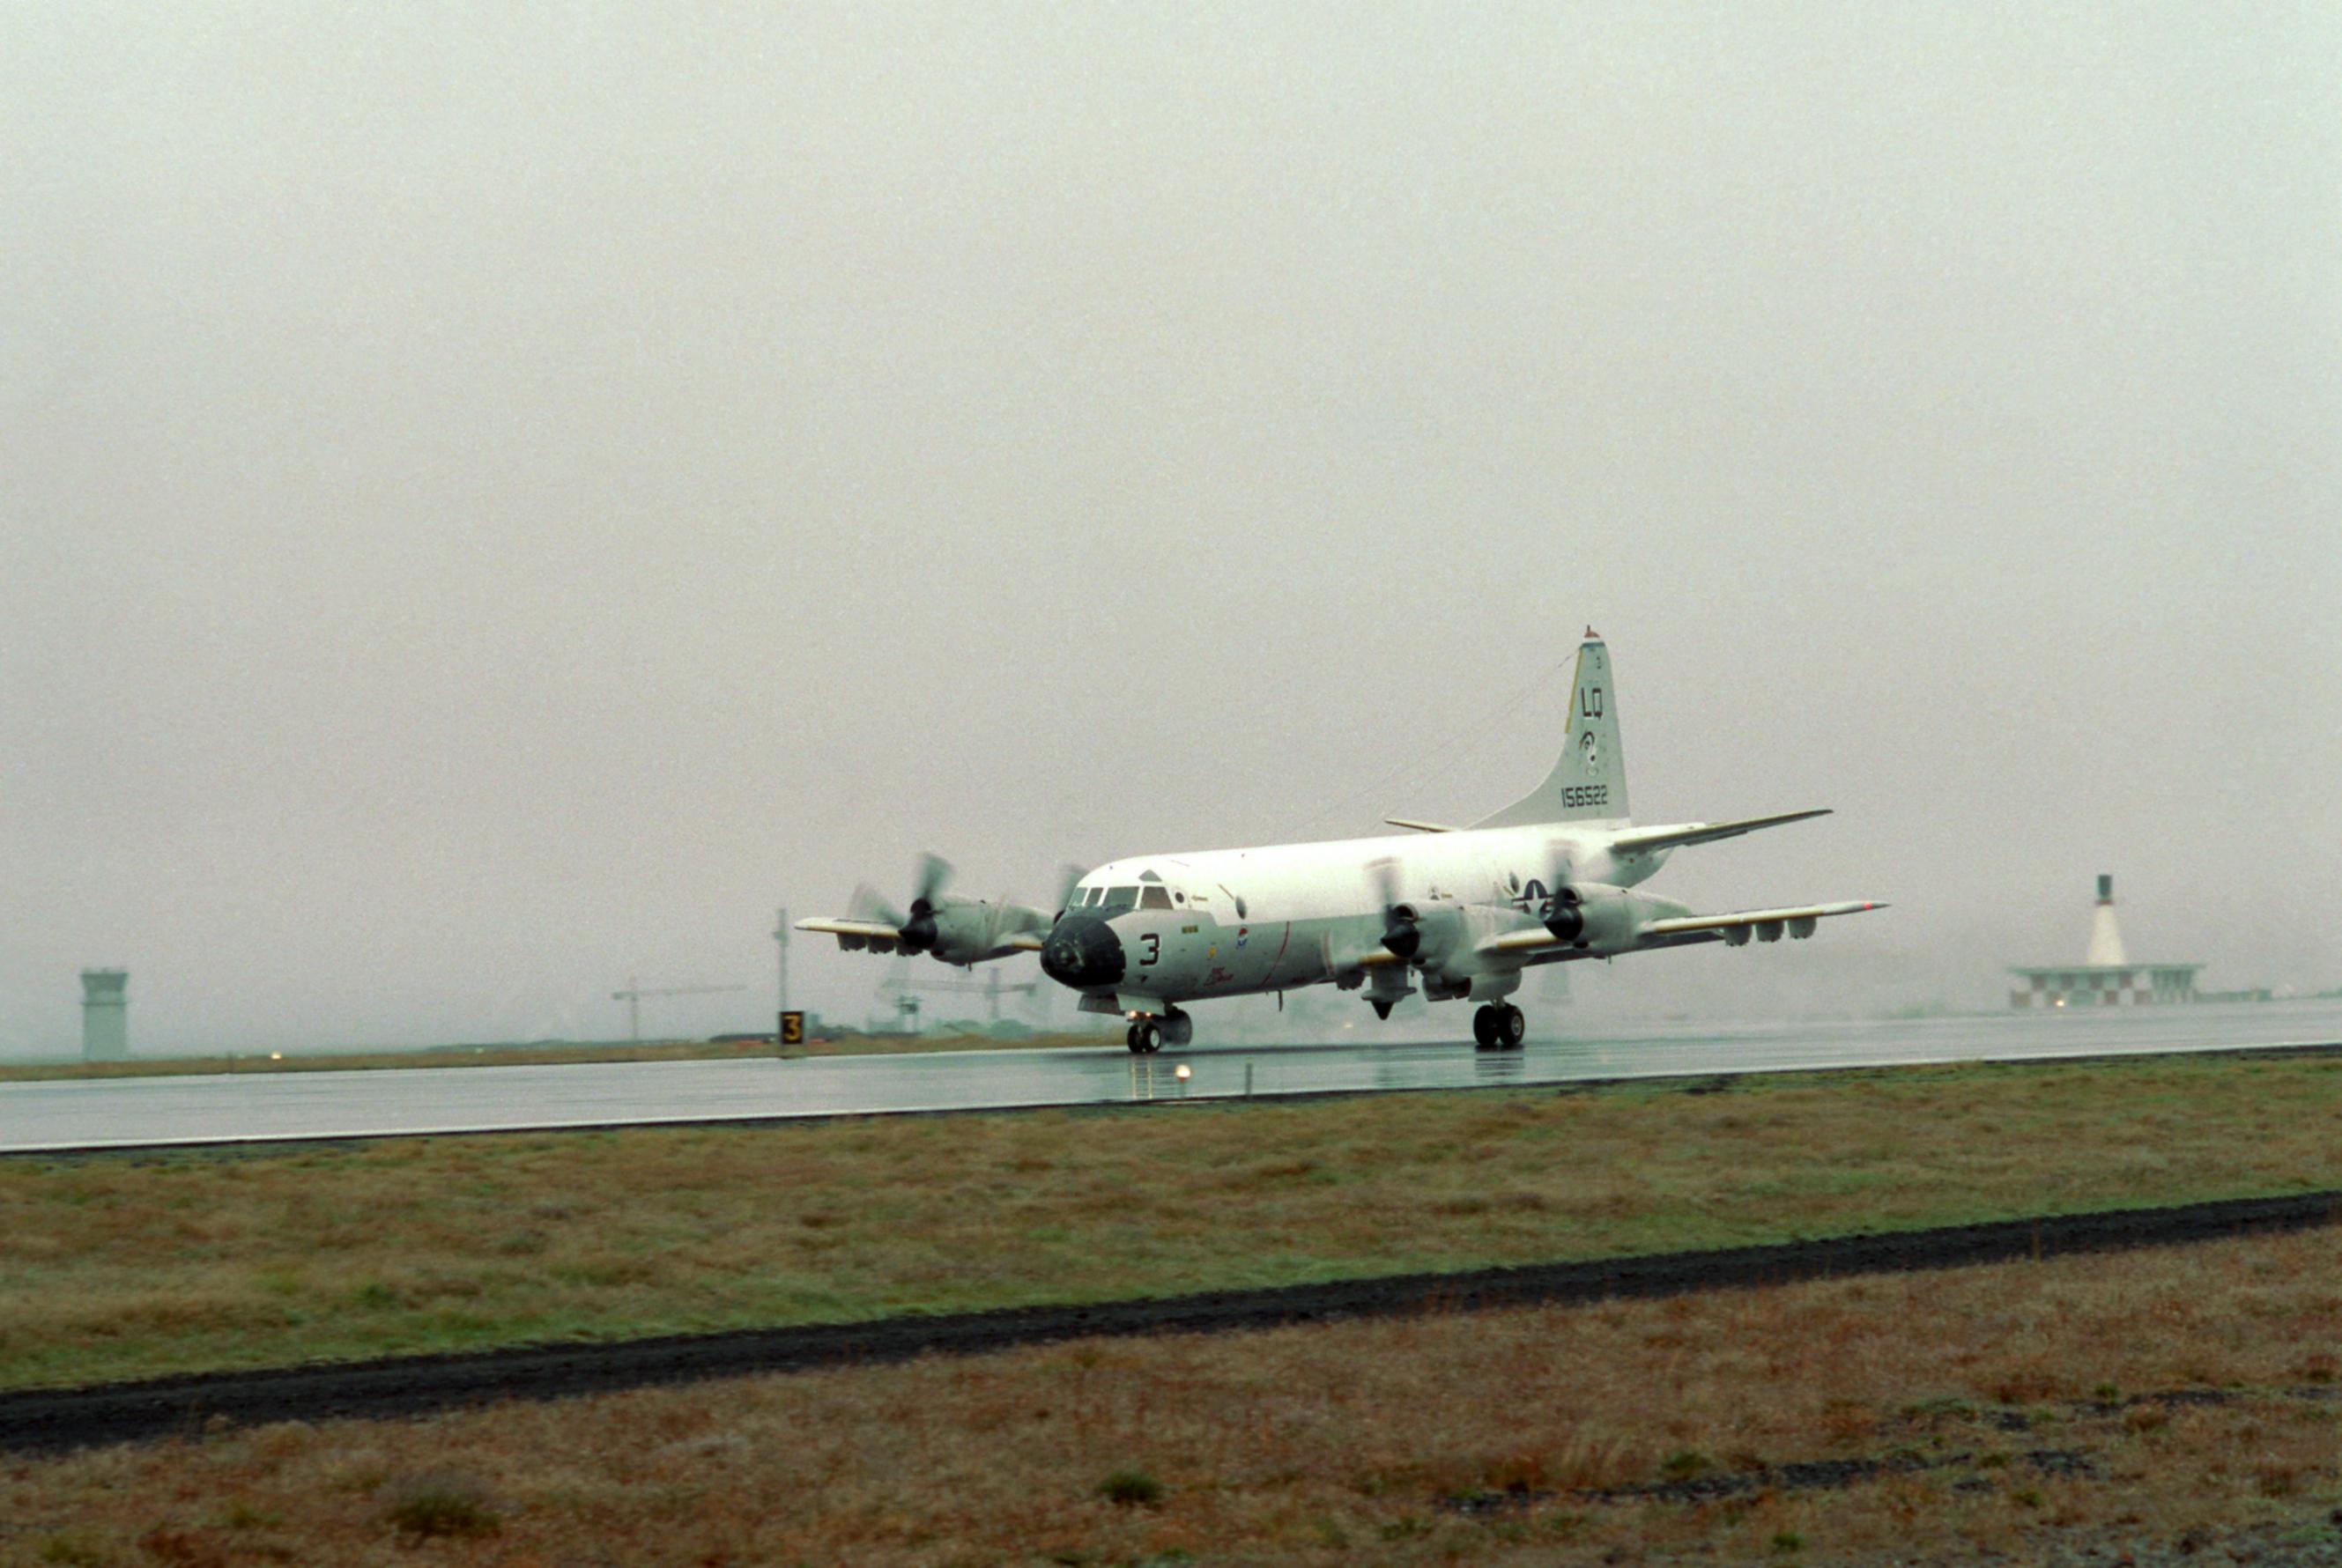 naval air station keflavik a u s navy p 3c orion of patrol squadron 56 vp 56 at keflavik 1977